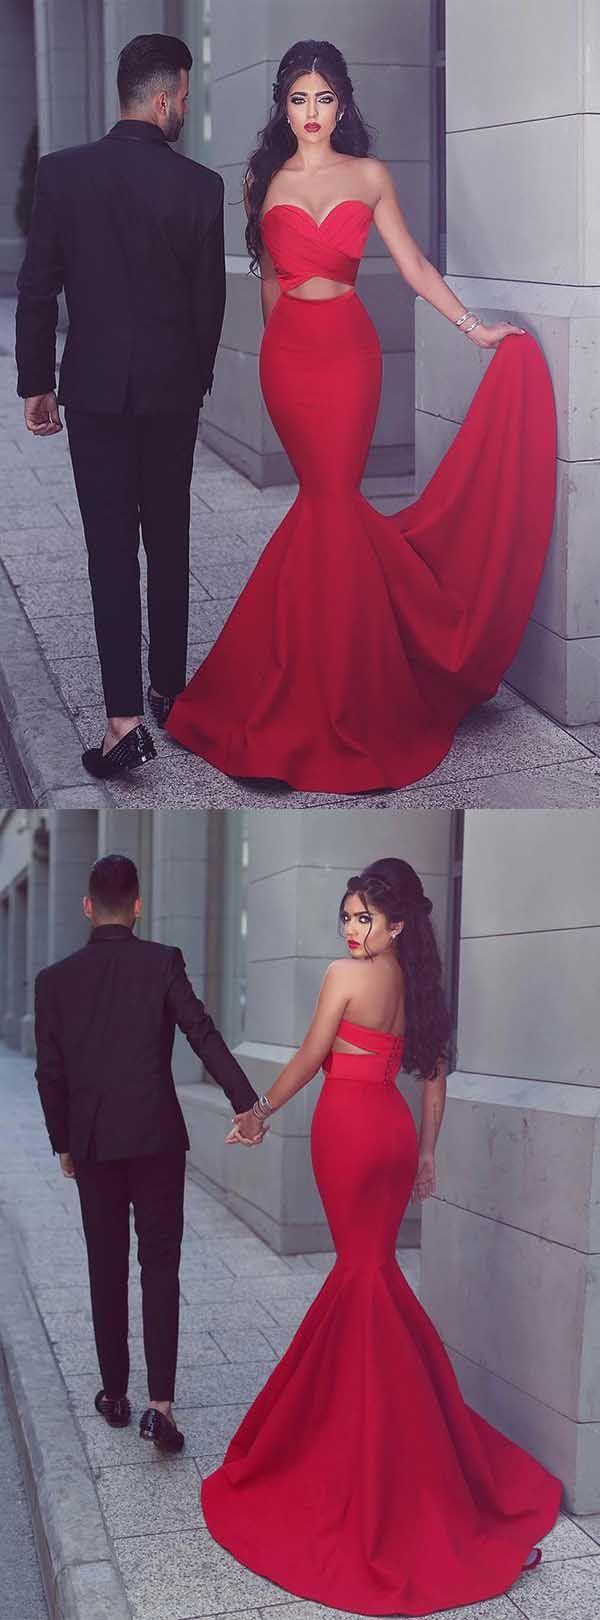 Mermaid Sweetheart Sweep Train Red Satin Prom/Evening Dress PG566 #promdresses #eveningdresses #pgmdress #fashion #mermaid